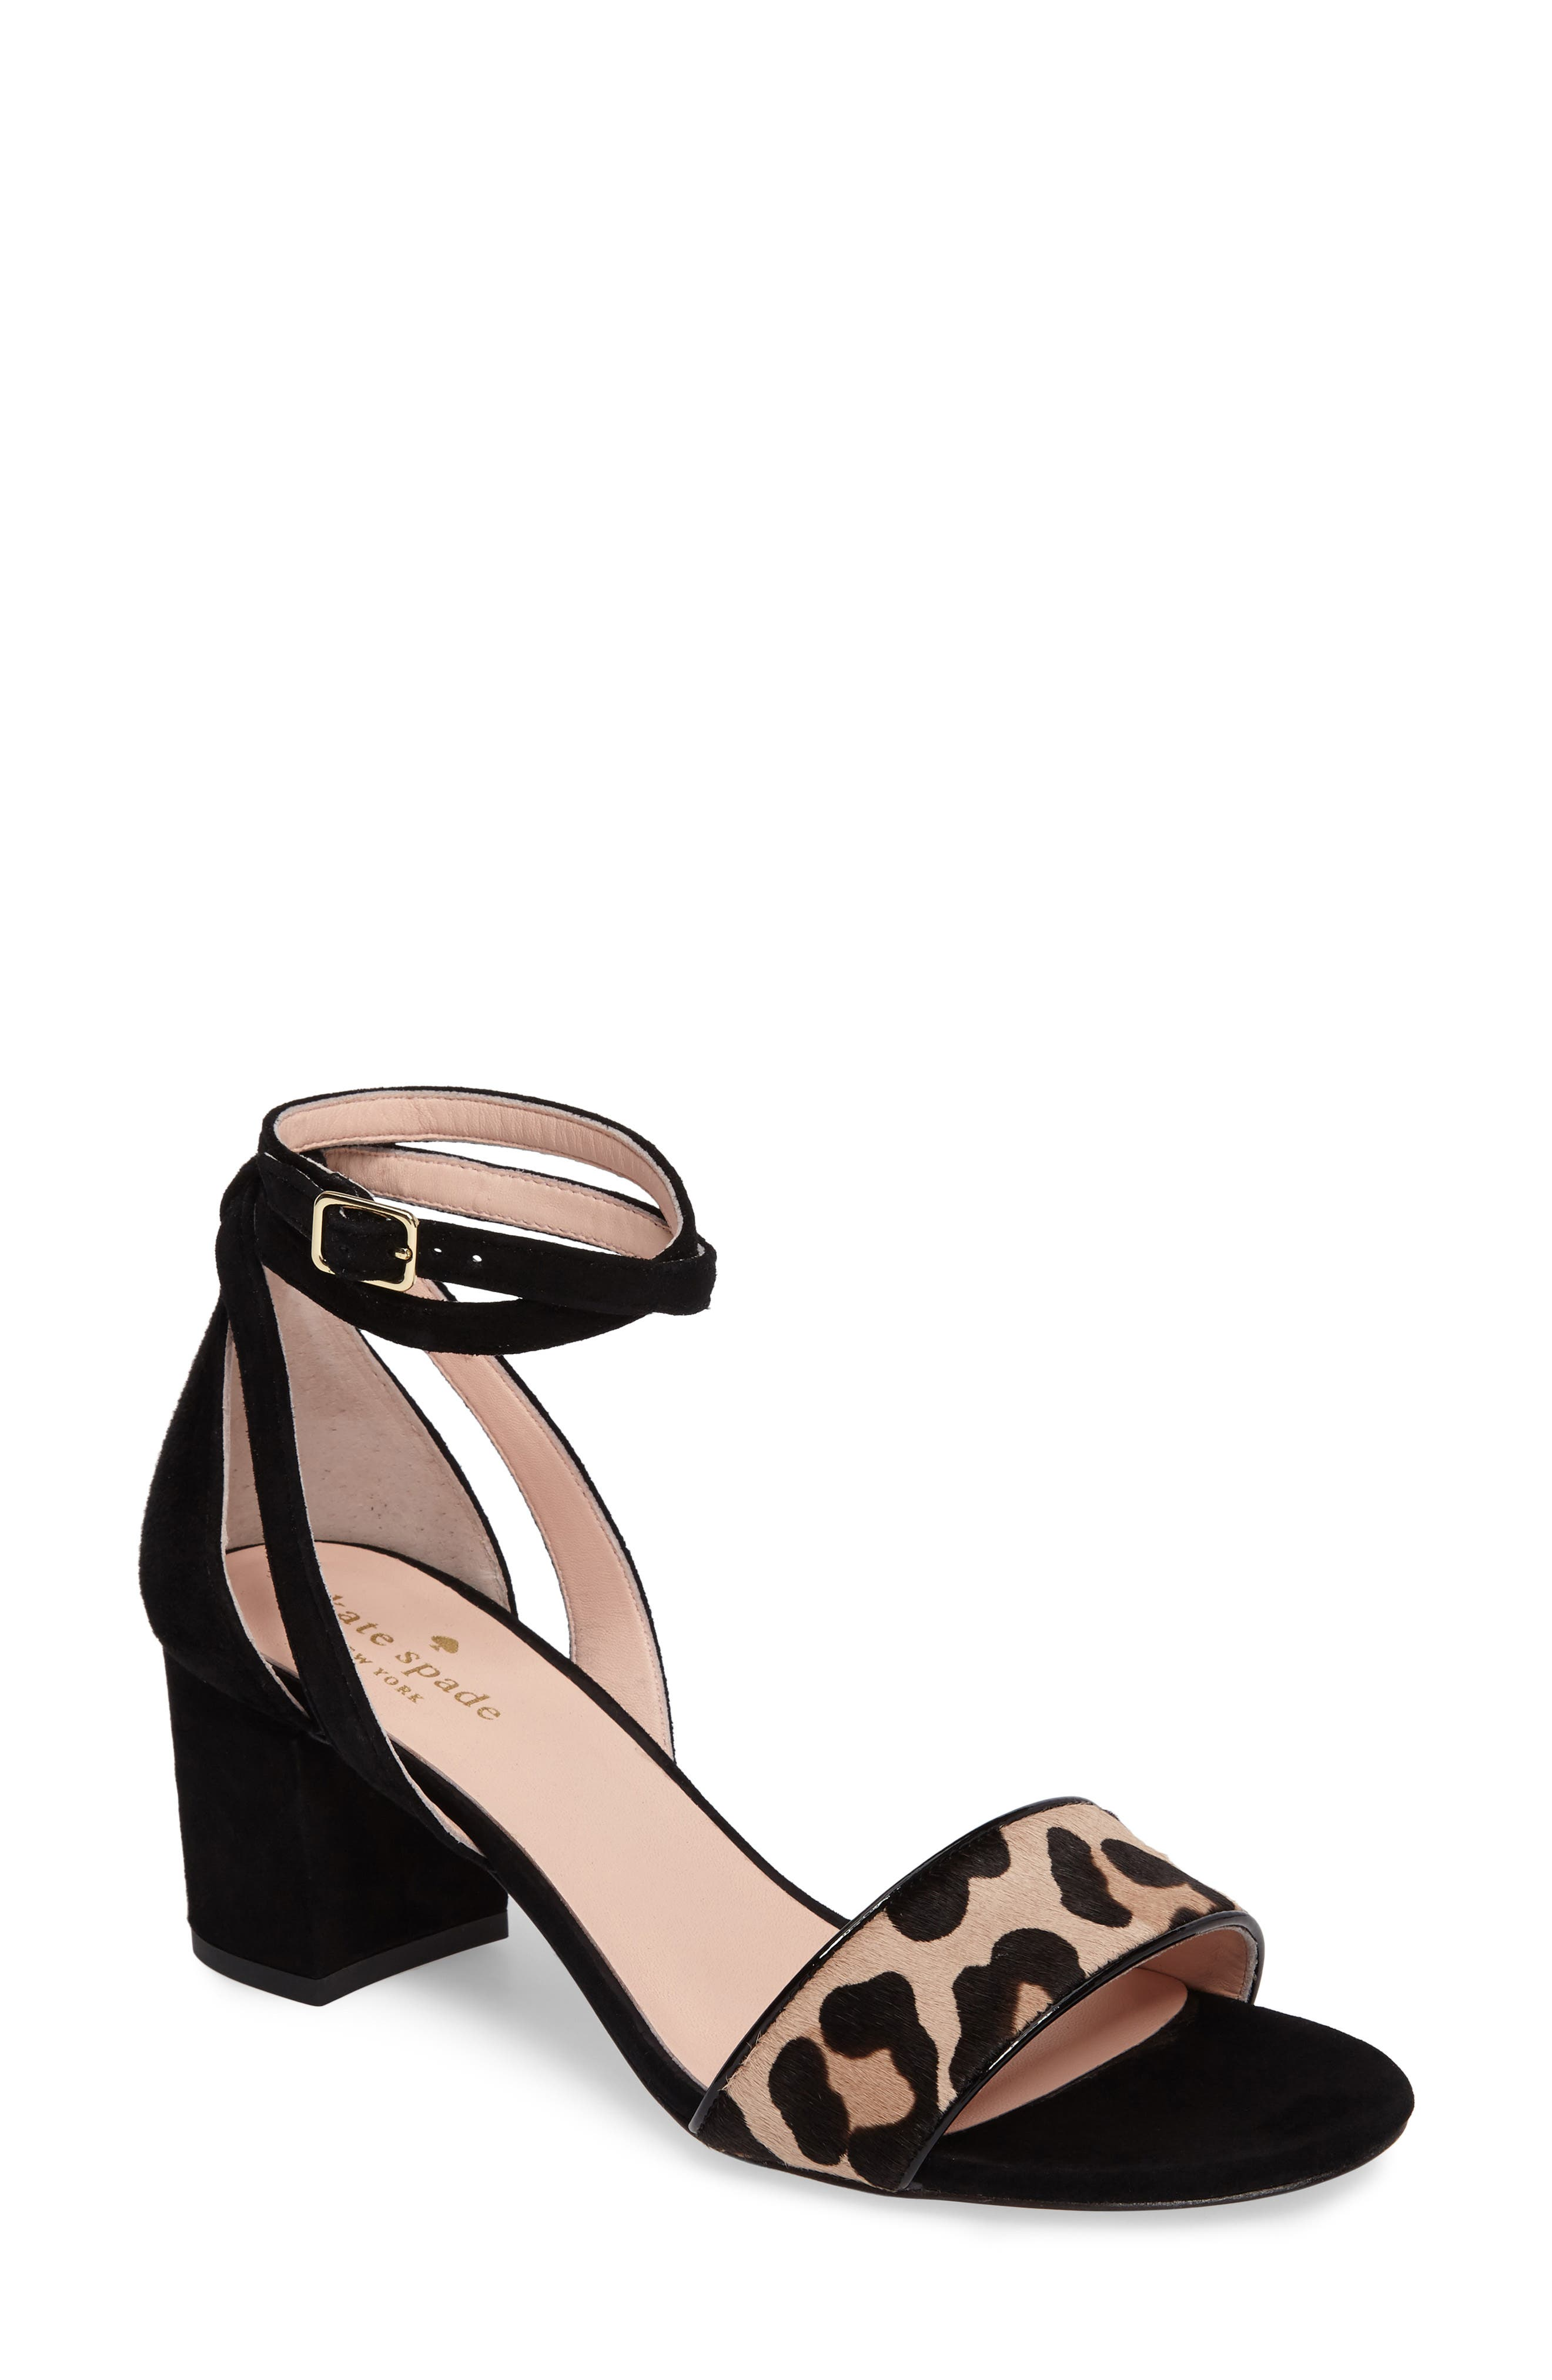 Alternate Image 1 Selected - kate spade new york watson genuine calf hair block heel sandal (Women)